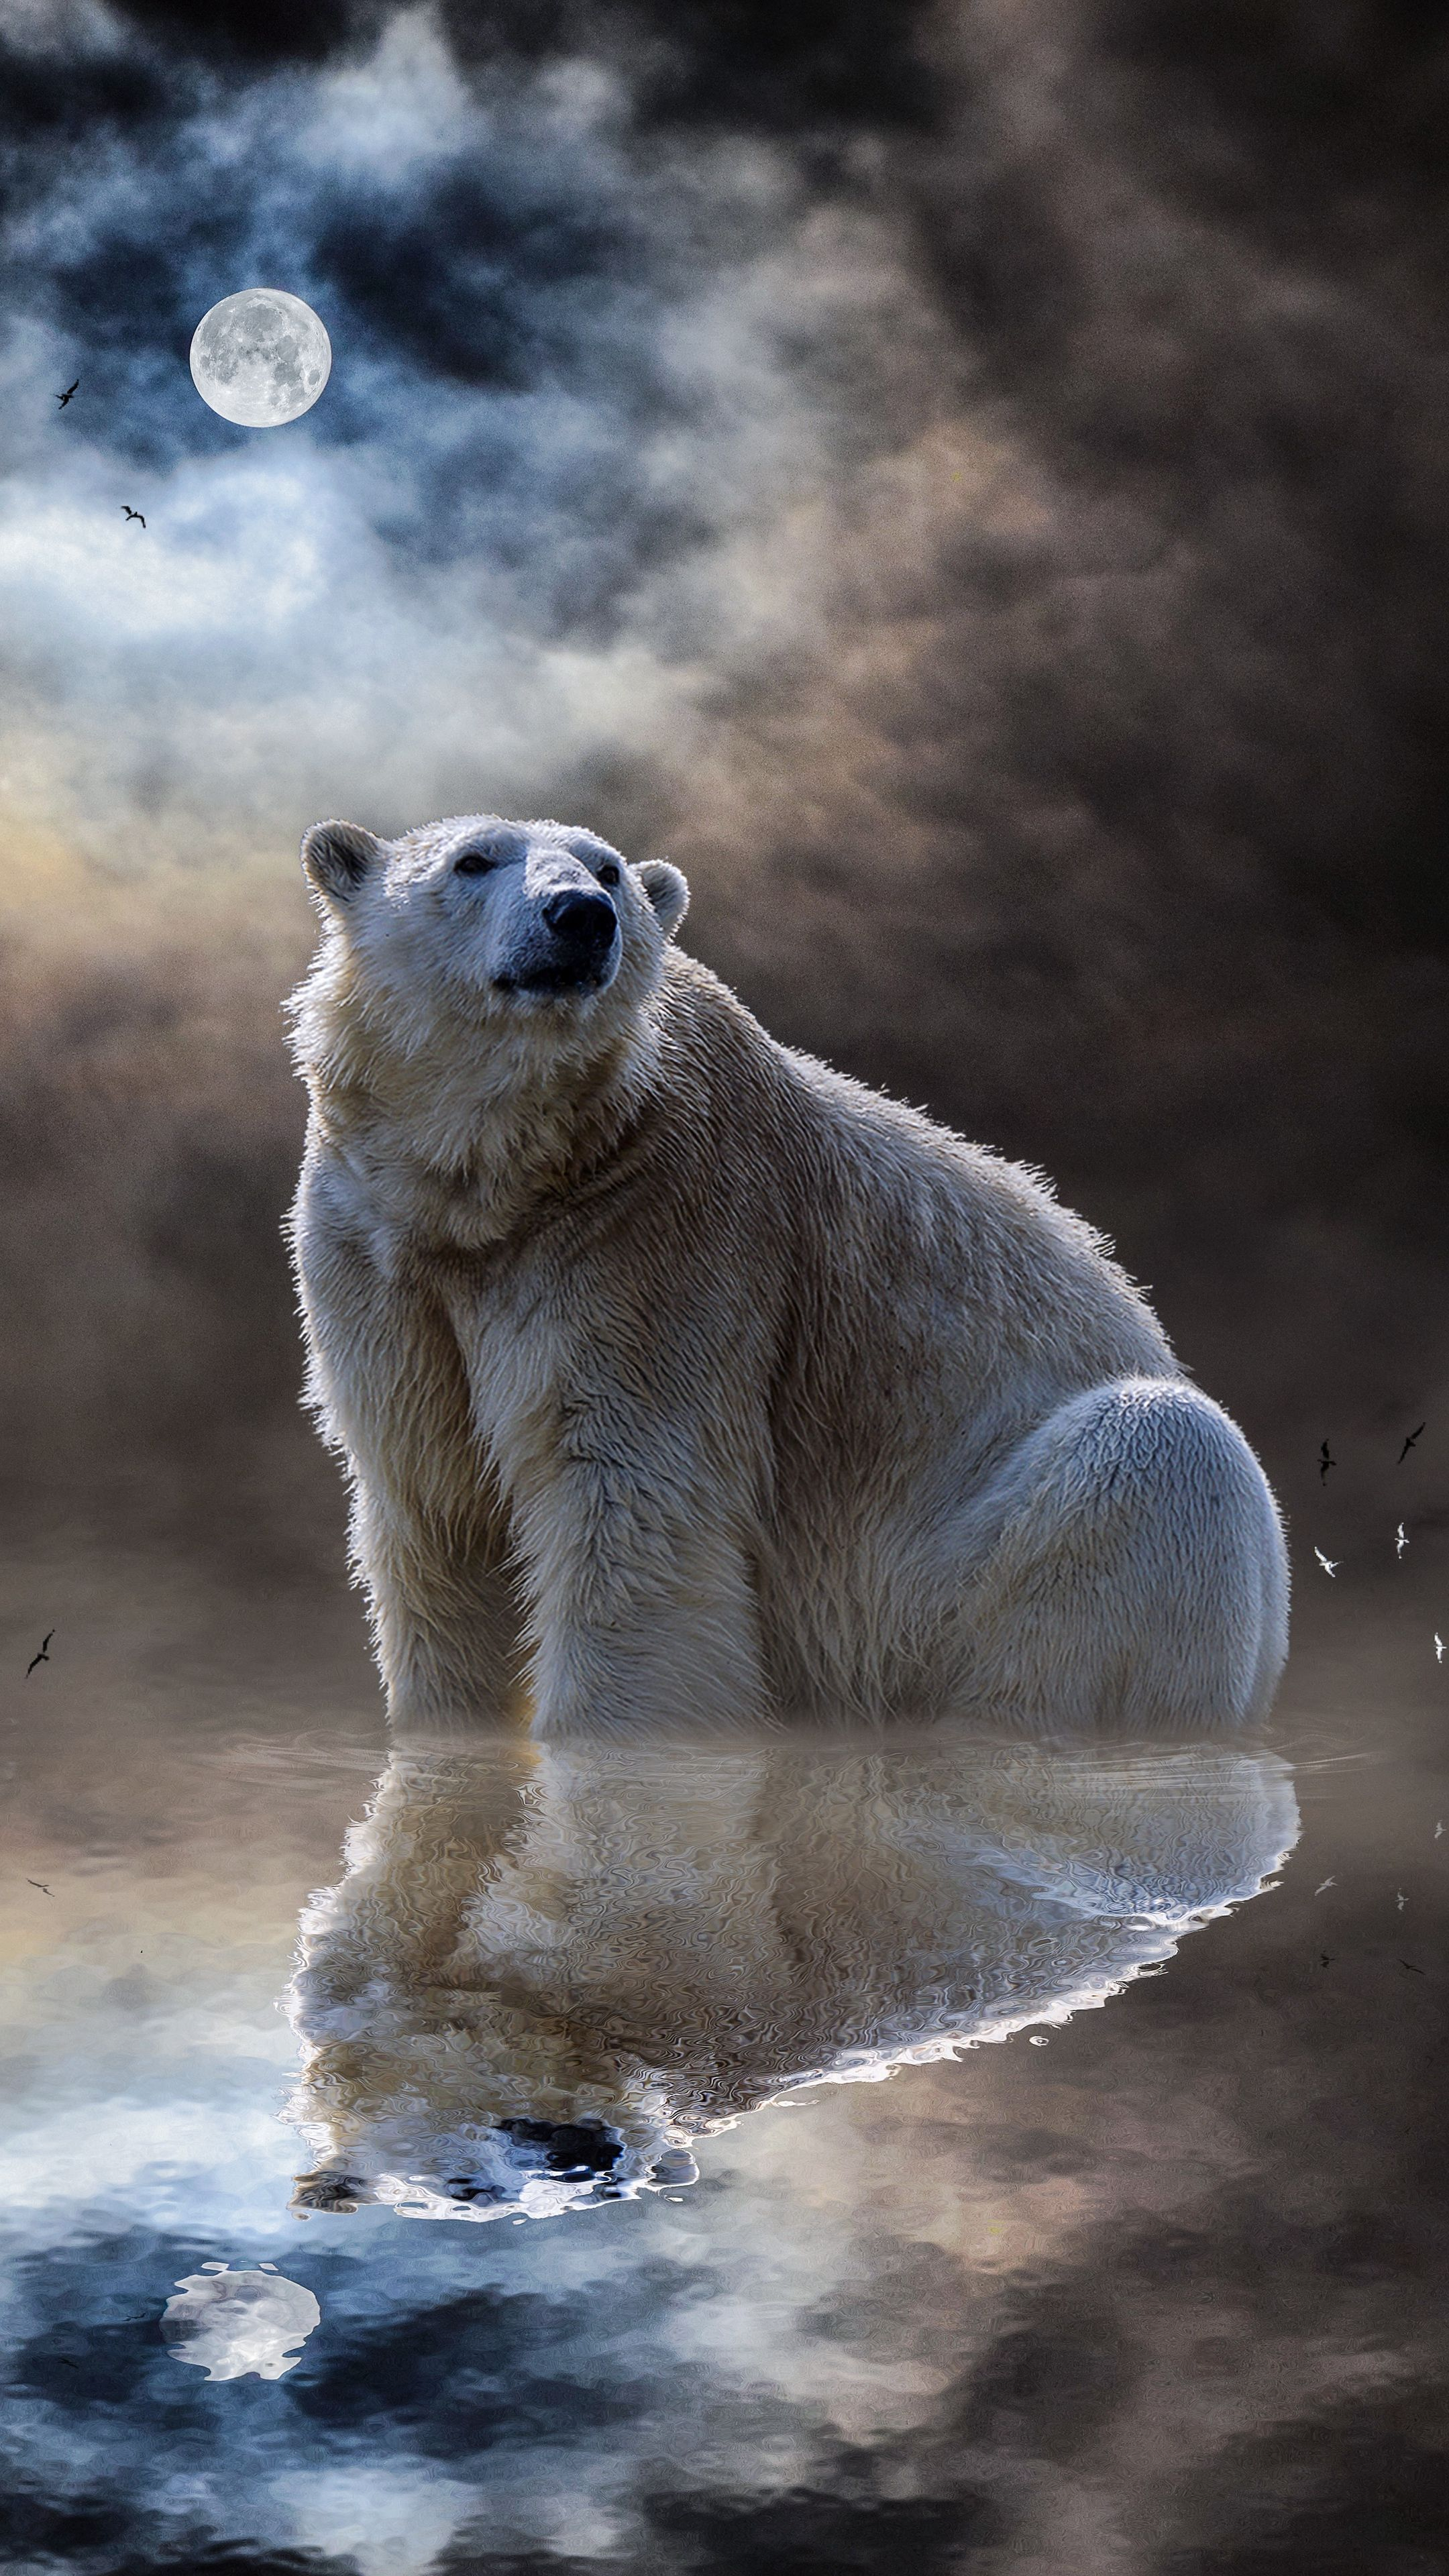 Animals polarbear ocean reflection wallpapers hd 4k